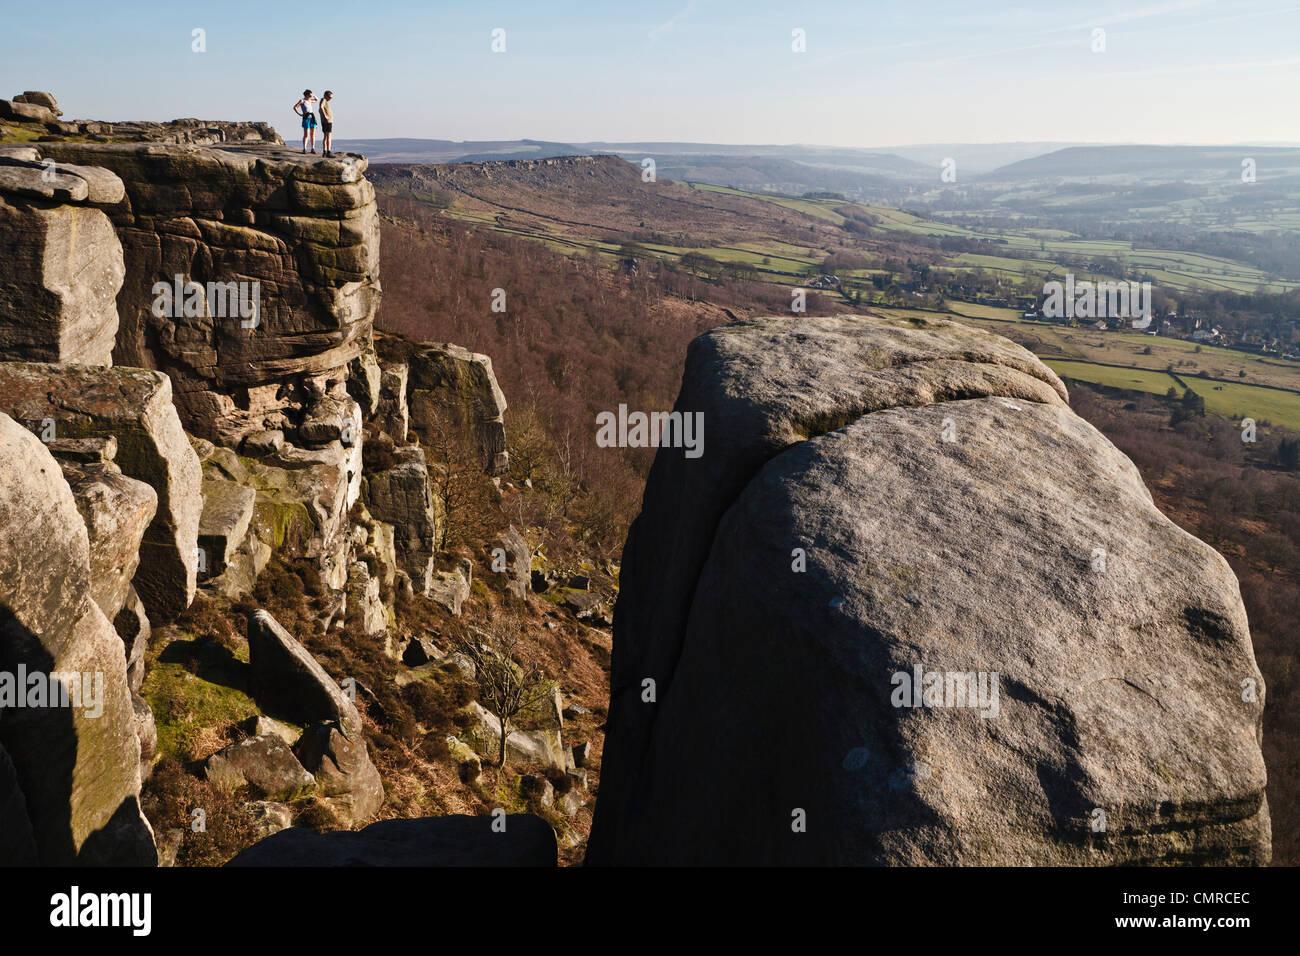 Froggatt Edge, Peak District National Park, Derbyshire, England - Stock Image